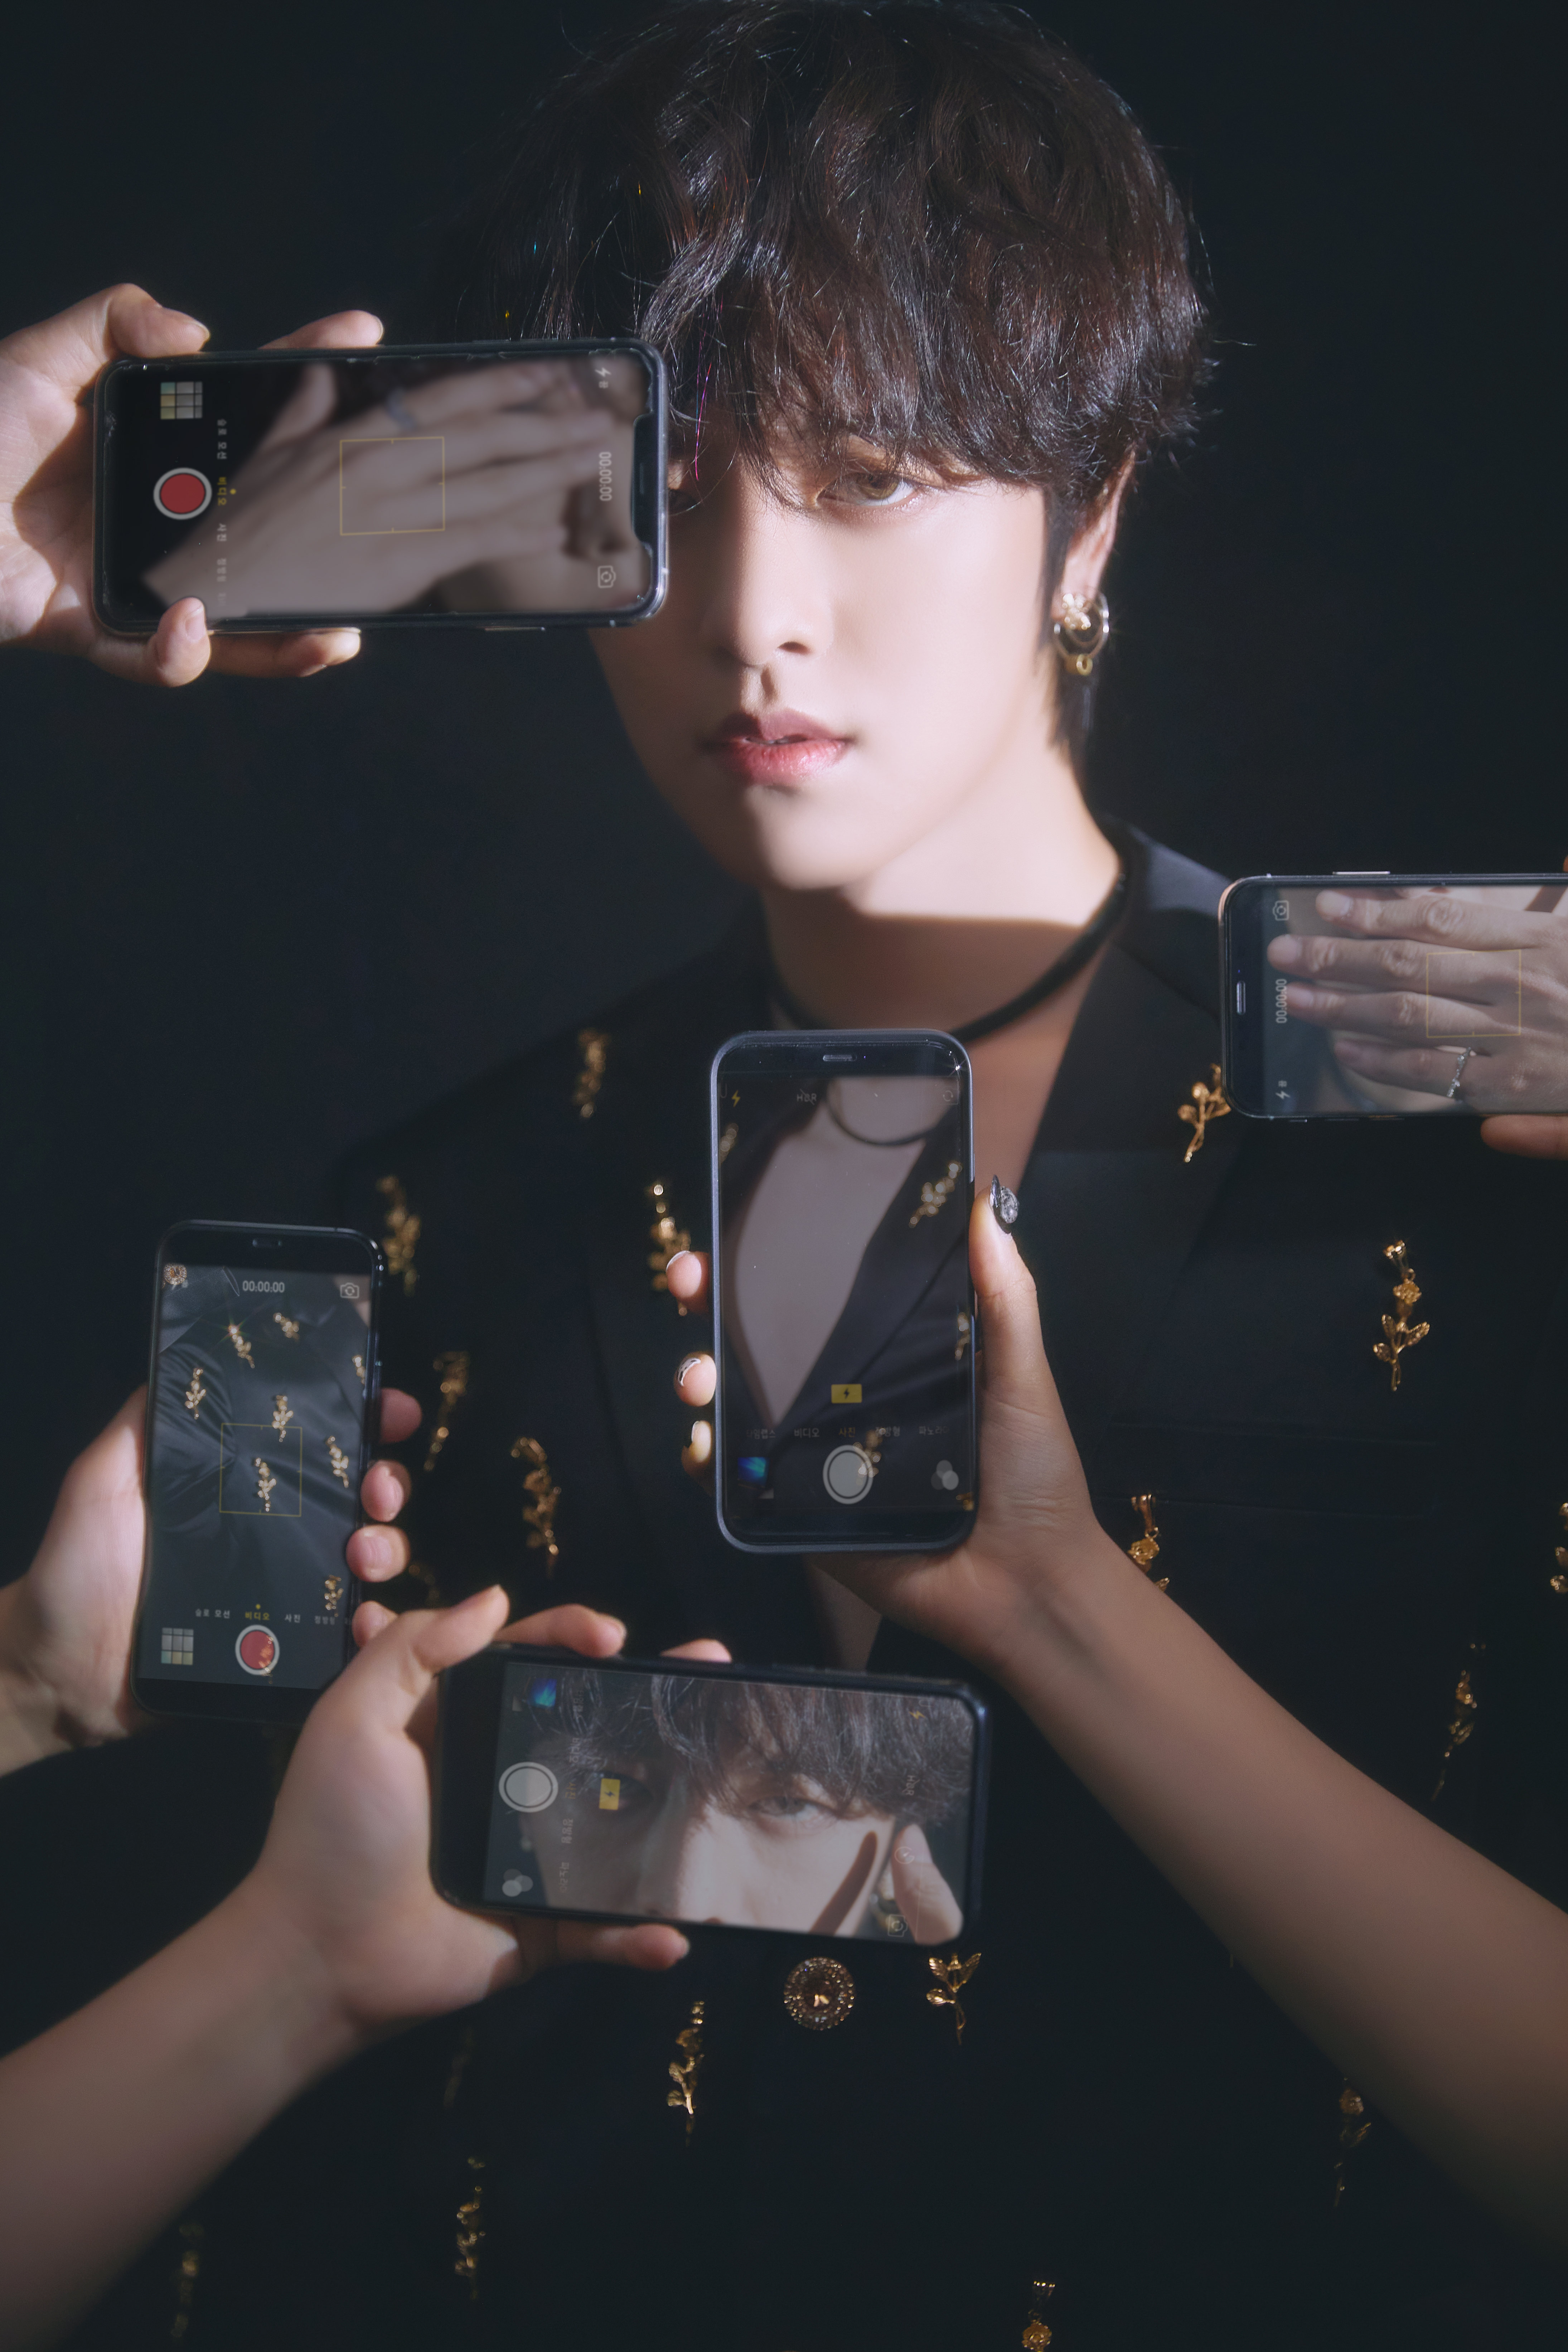 oneus_binary_code_black_mirror_concept_ravn